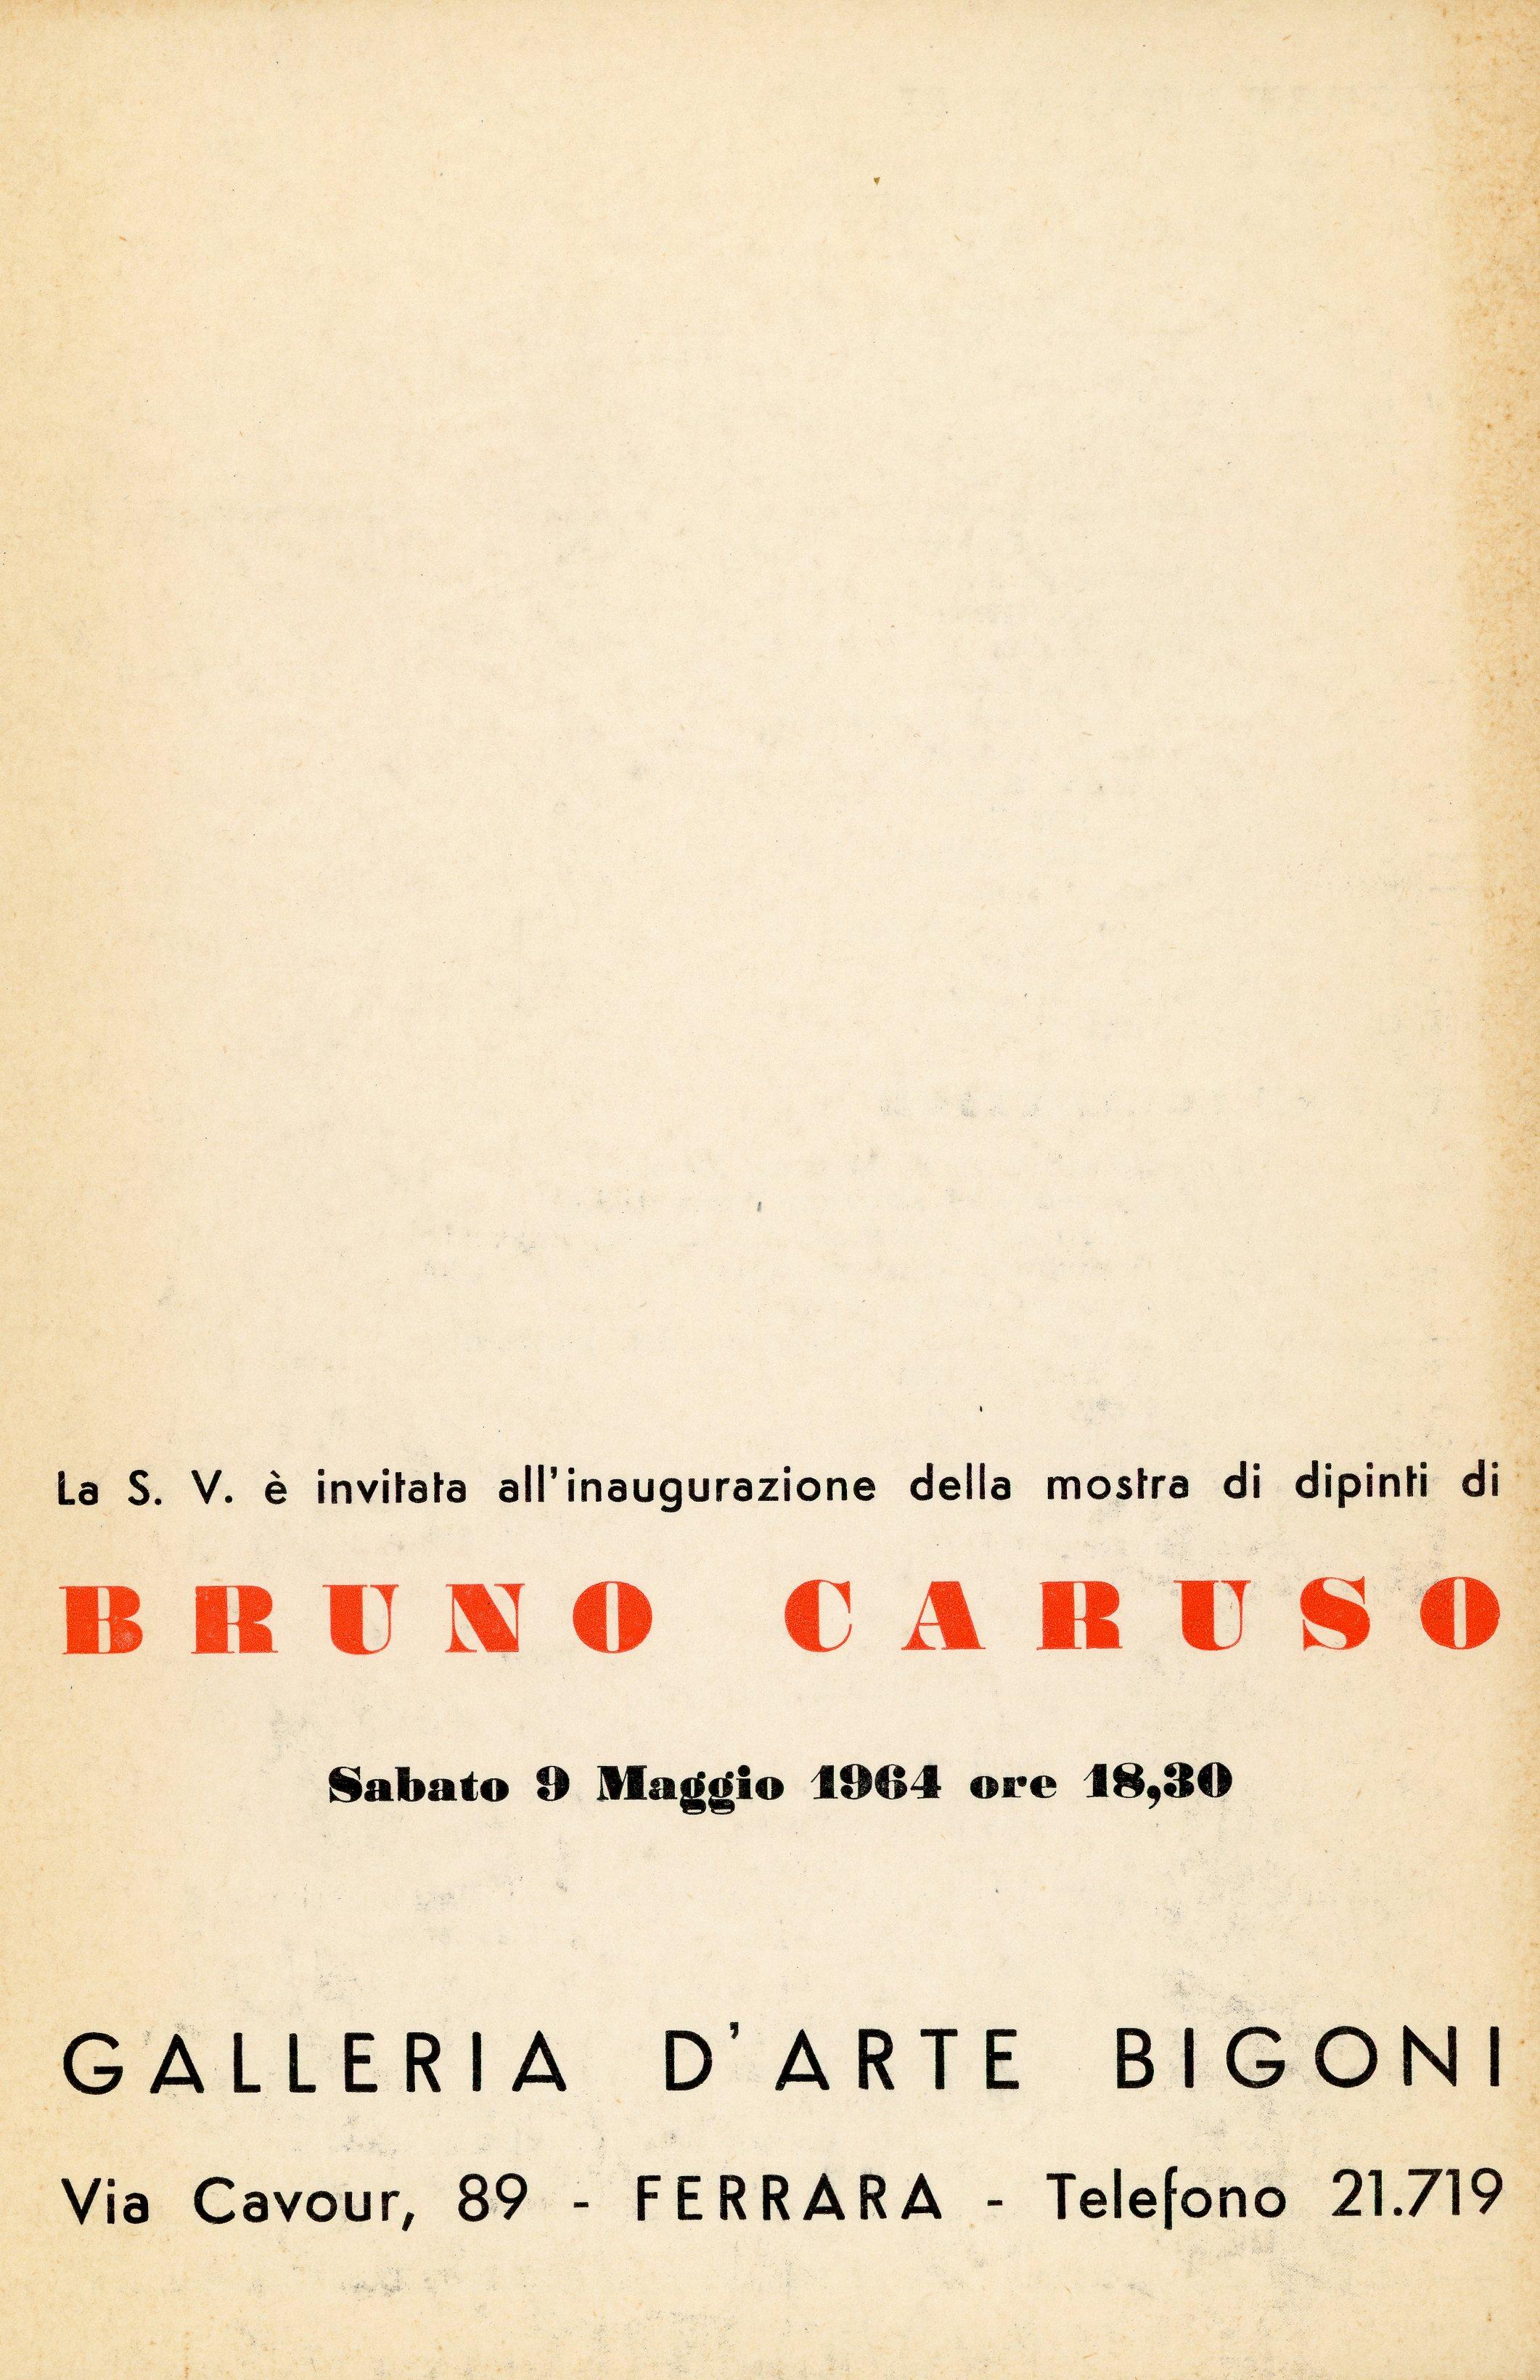 1964-05 Galleria Bigoni - Bruno Caruso_08.jpg